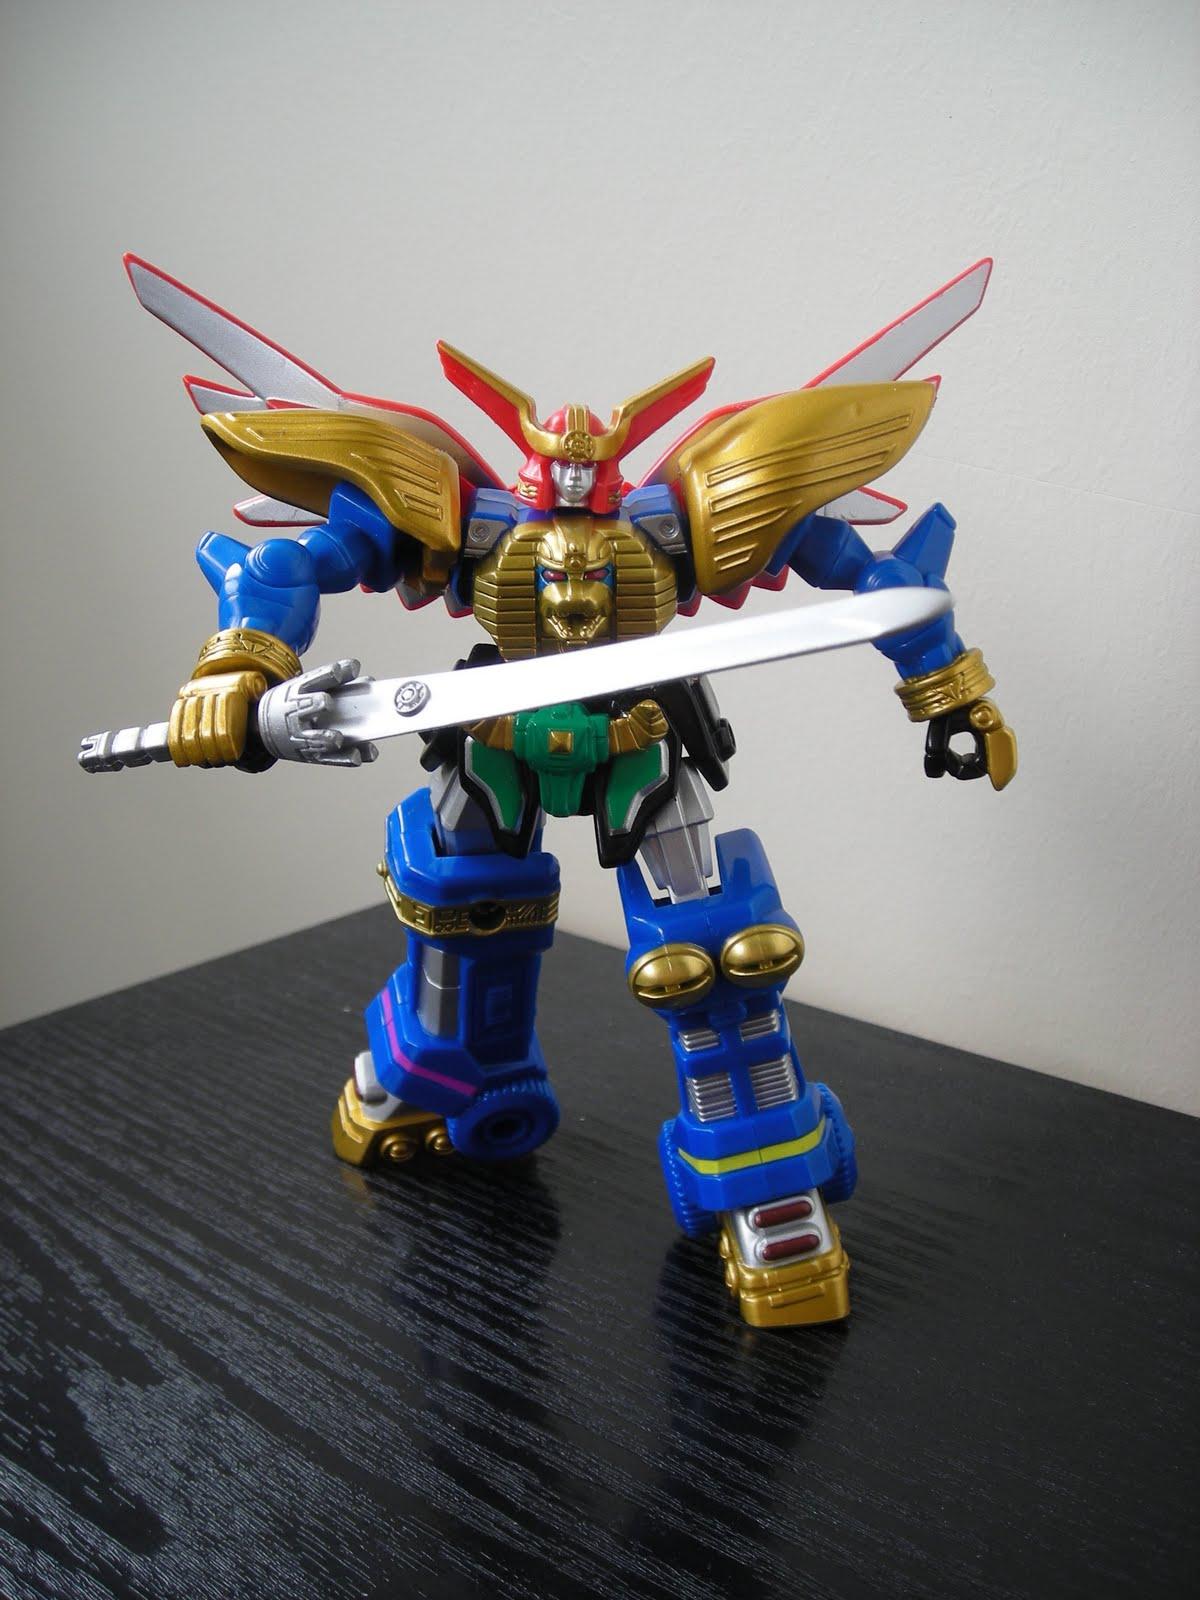 7 Power Rangers Samurai Megazord Toy Review